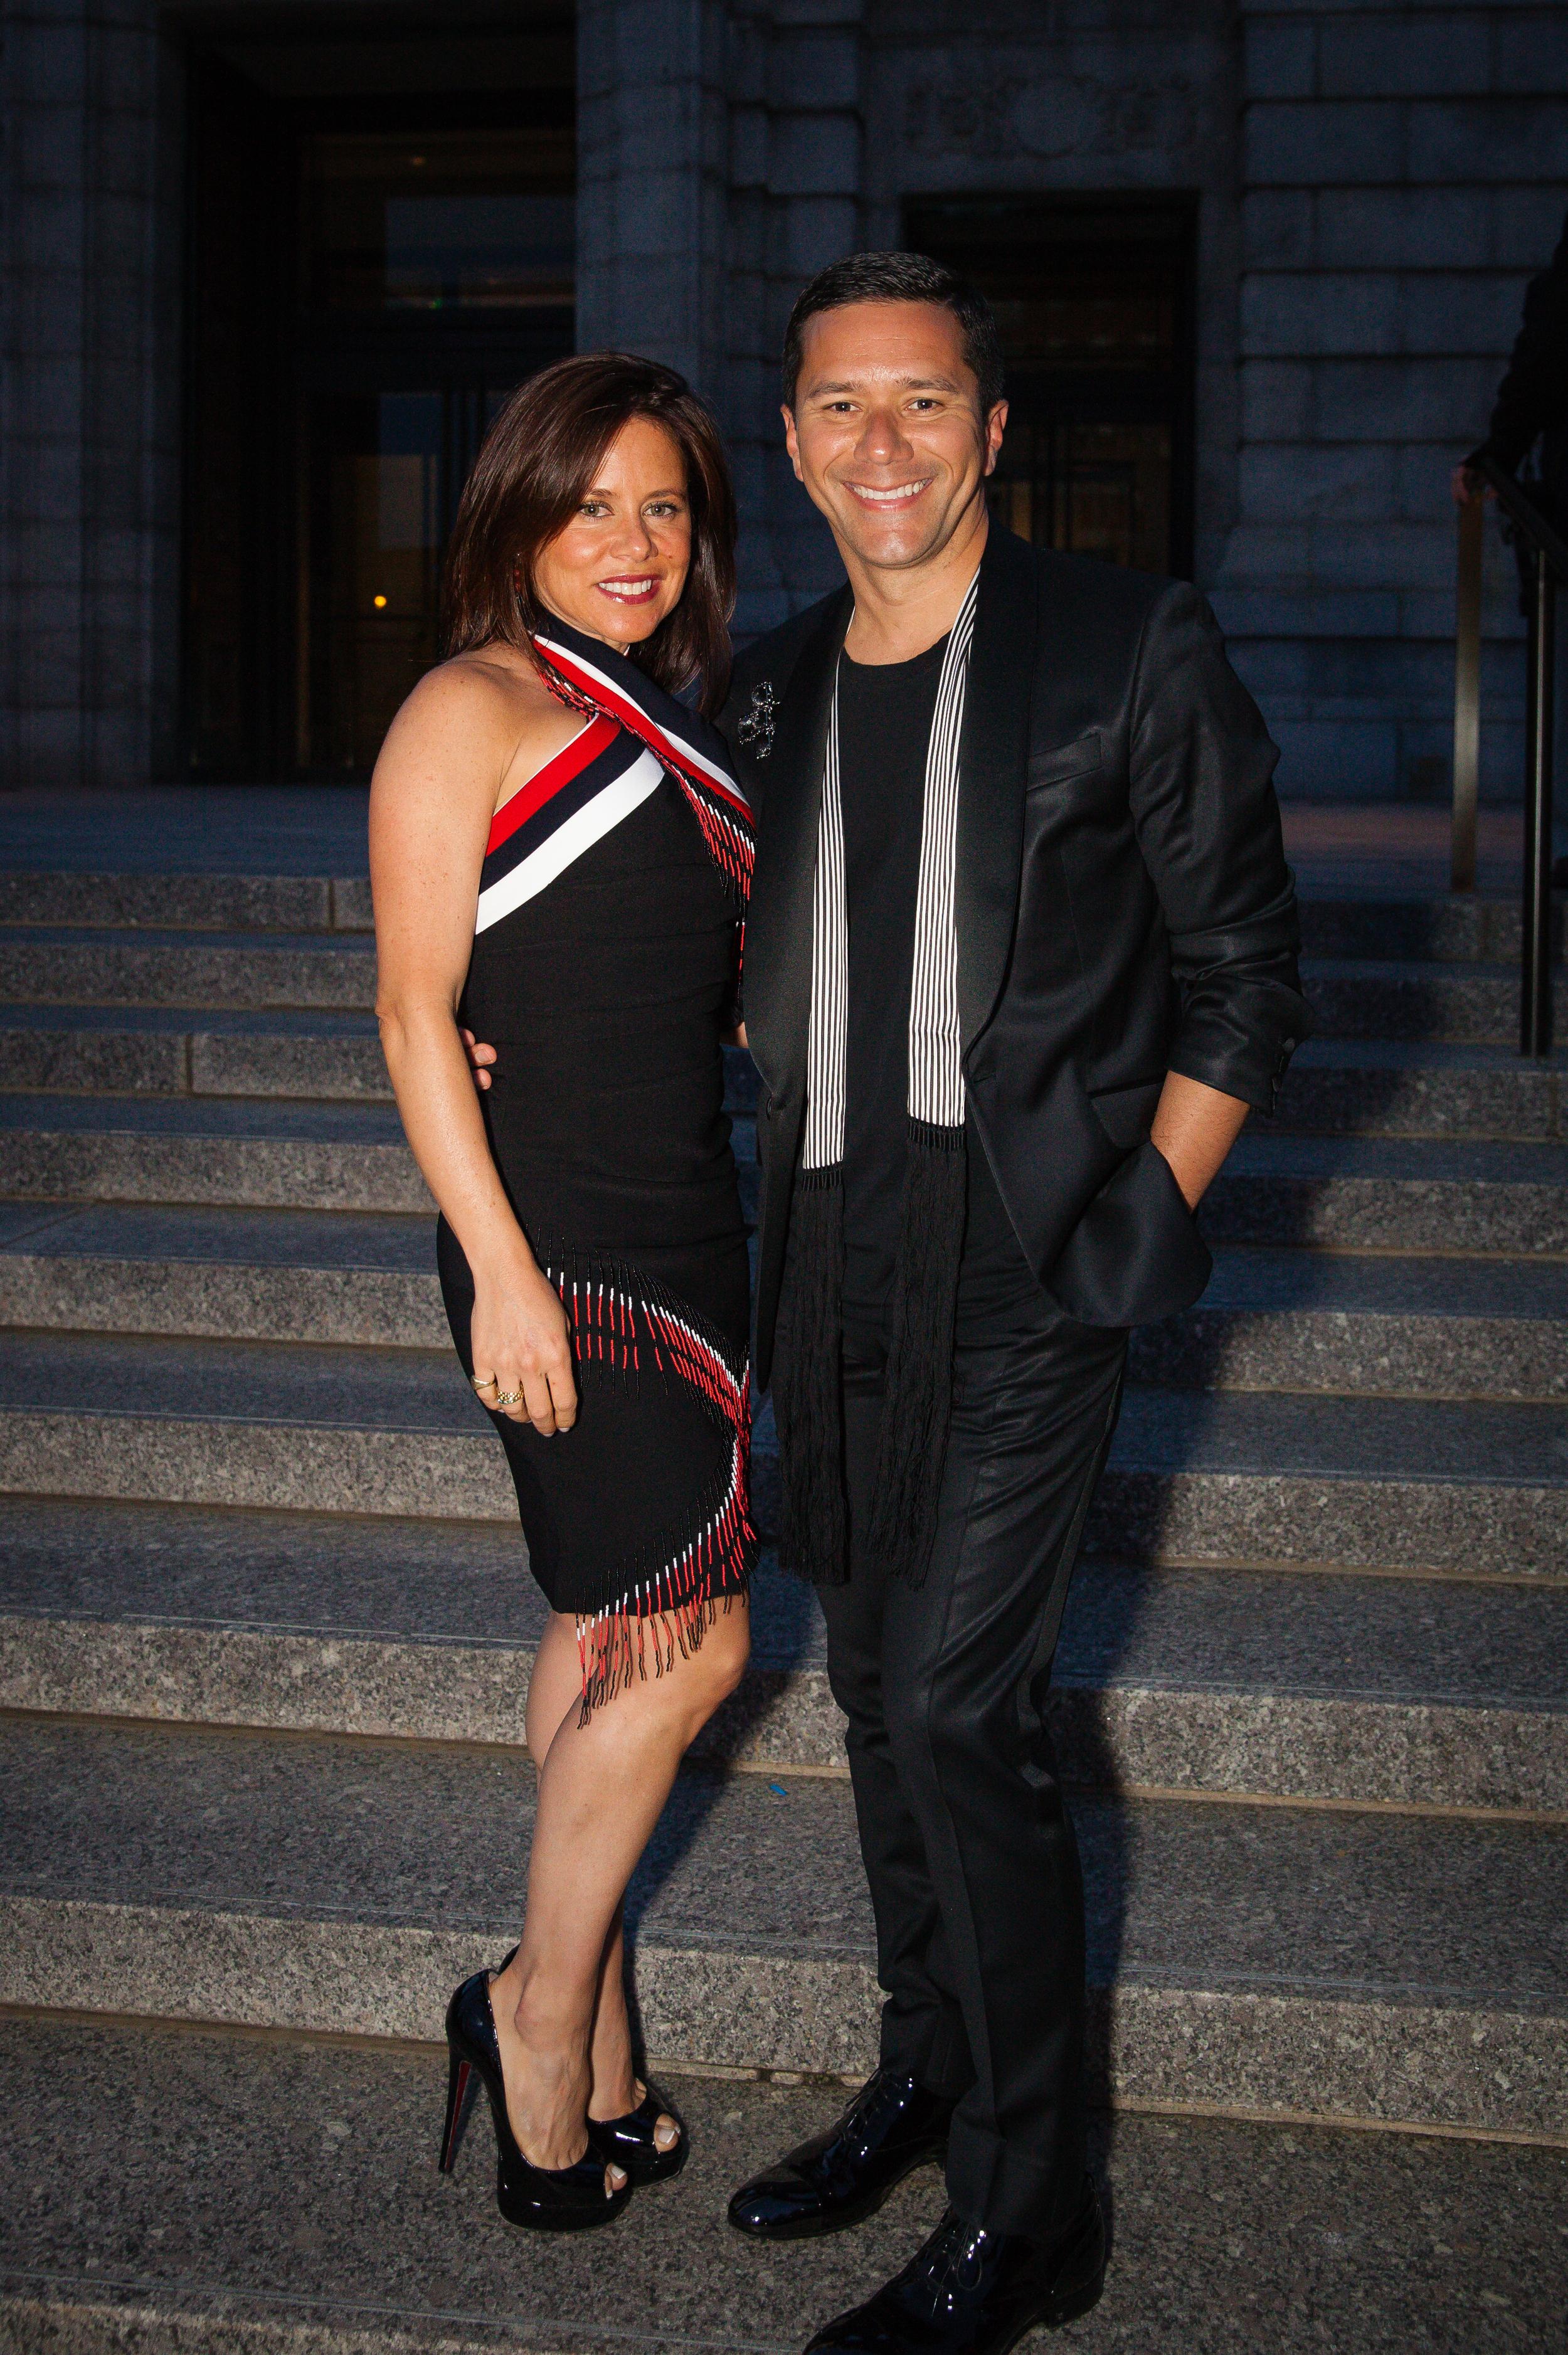 Daniela Corta and Ricardo Rodriguez~ On Daniela, Preen Dress. Preen heels. On Ricardo, Balmain tuxedo. Ann Demeulemeester scarf. Chanel brooch. Louis Vuitton shoes.